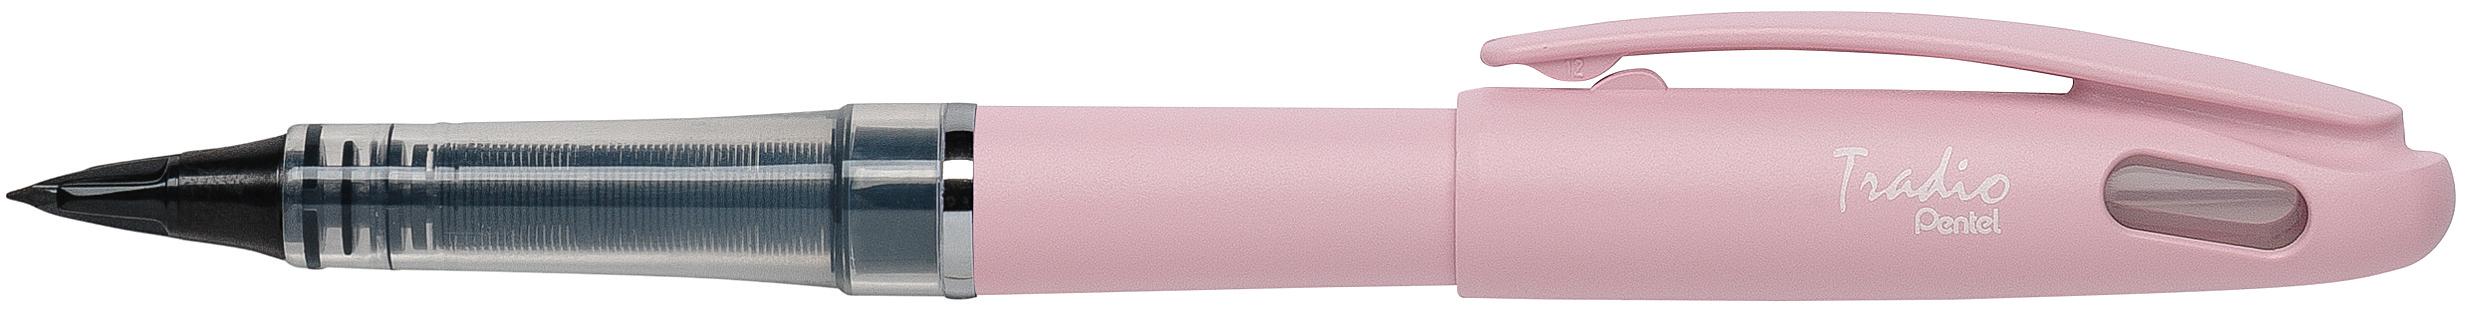 Pentel Tradio Pastel - Feutre plume - corps rose